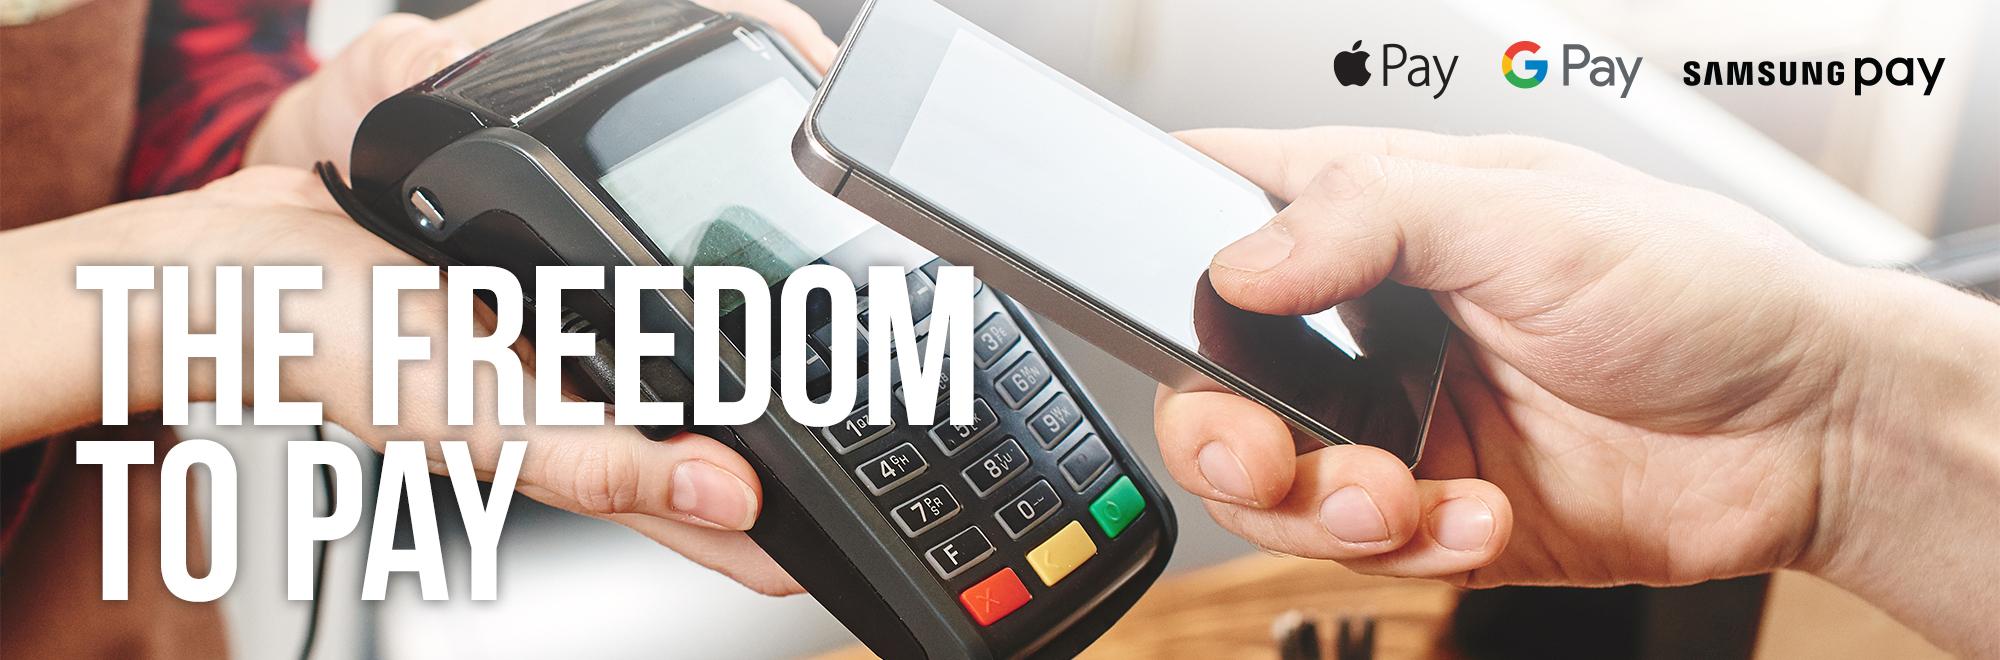 2018 Mobile Wallet